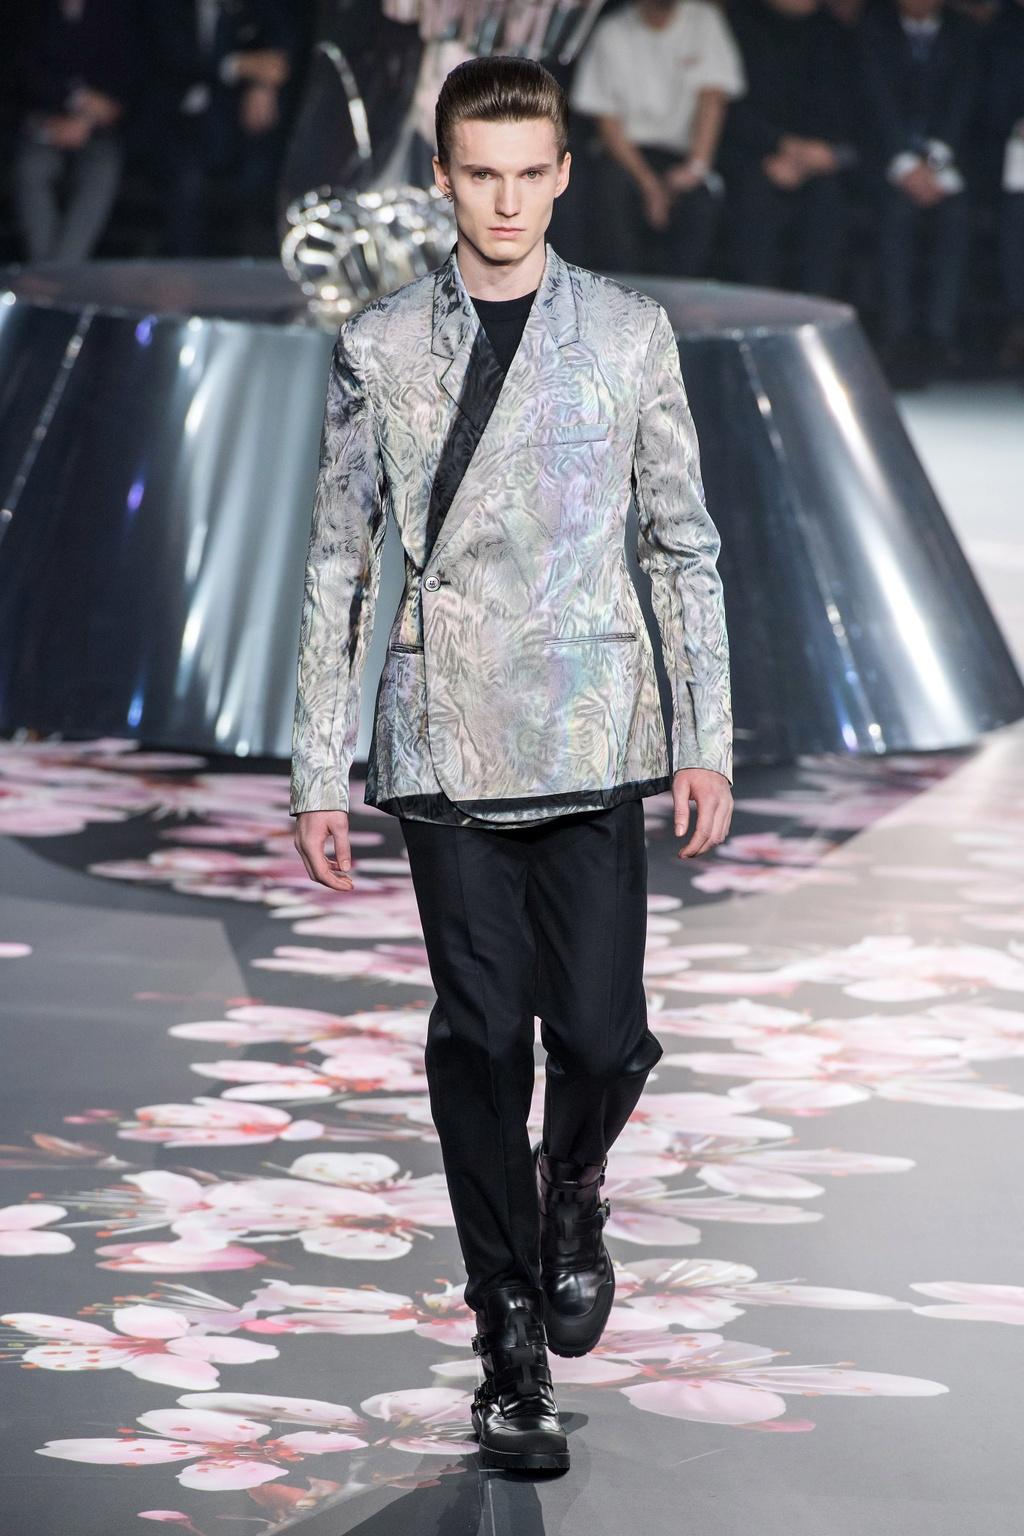 Show dien Dior gay sot voi phu kien giong bao dung sung hinh anh 9